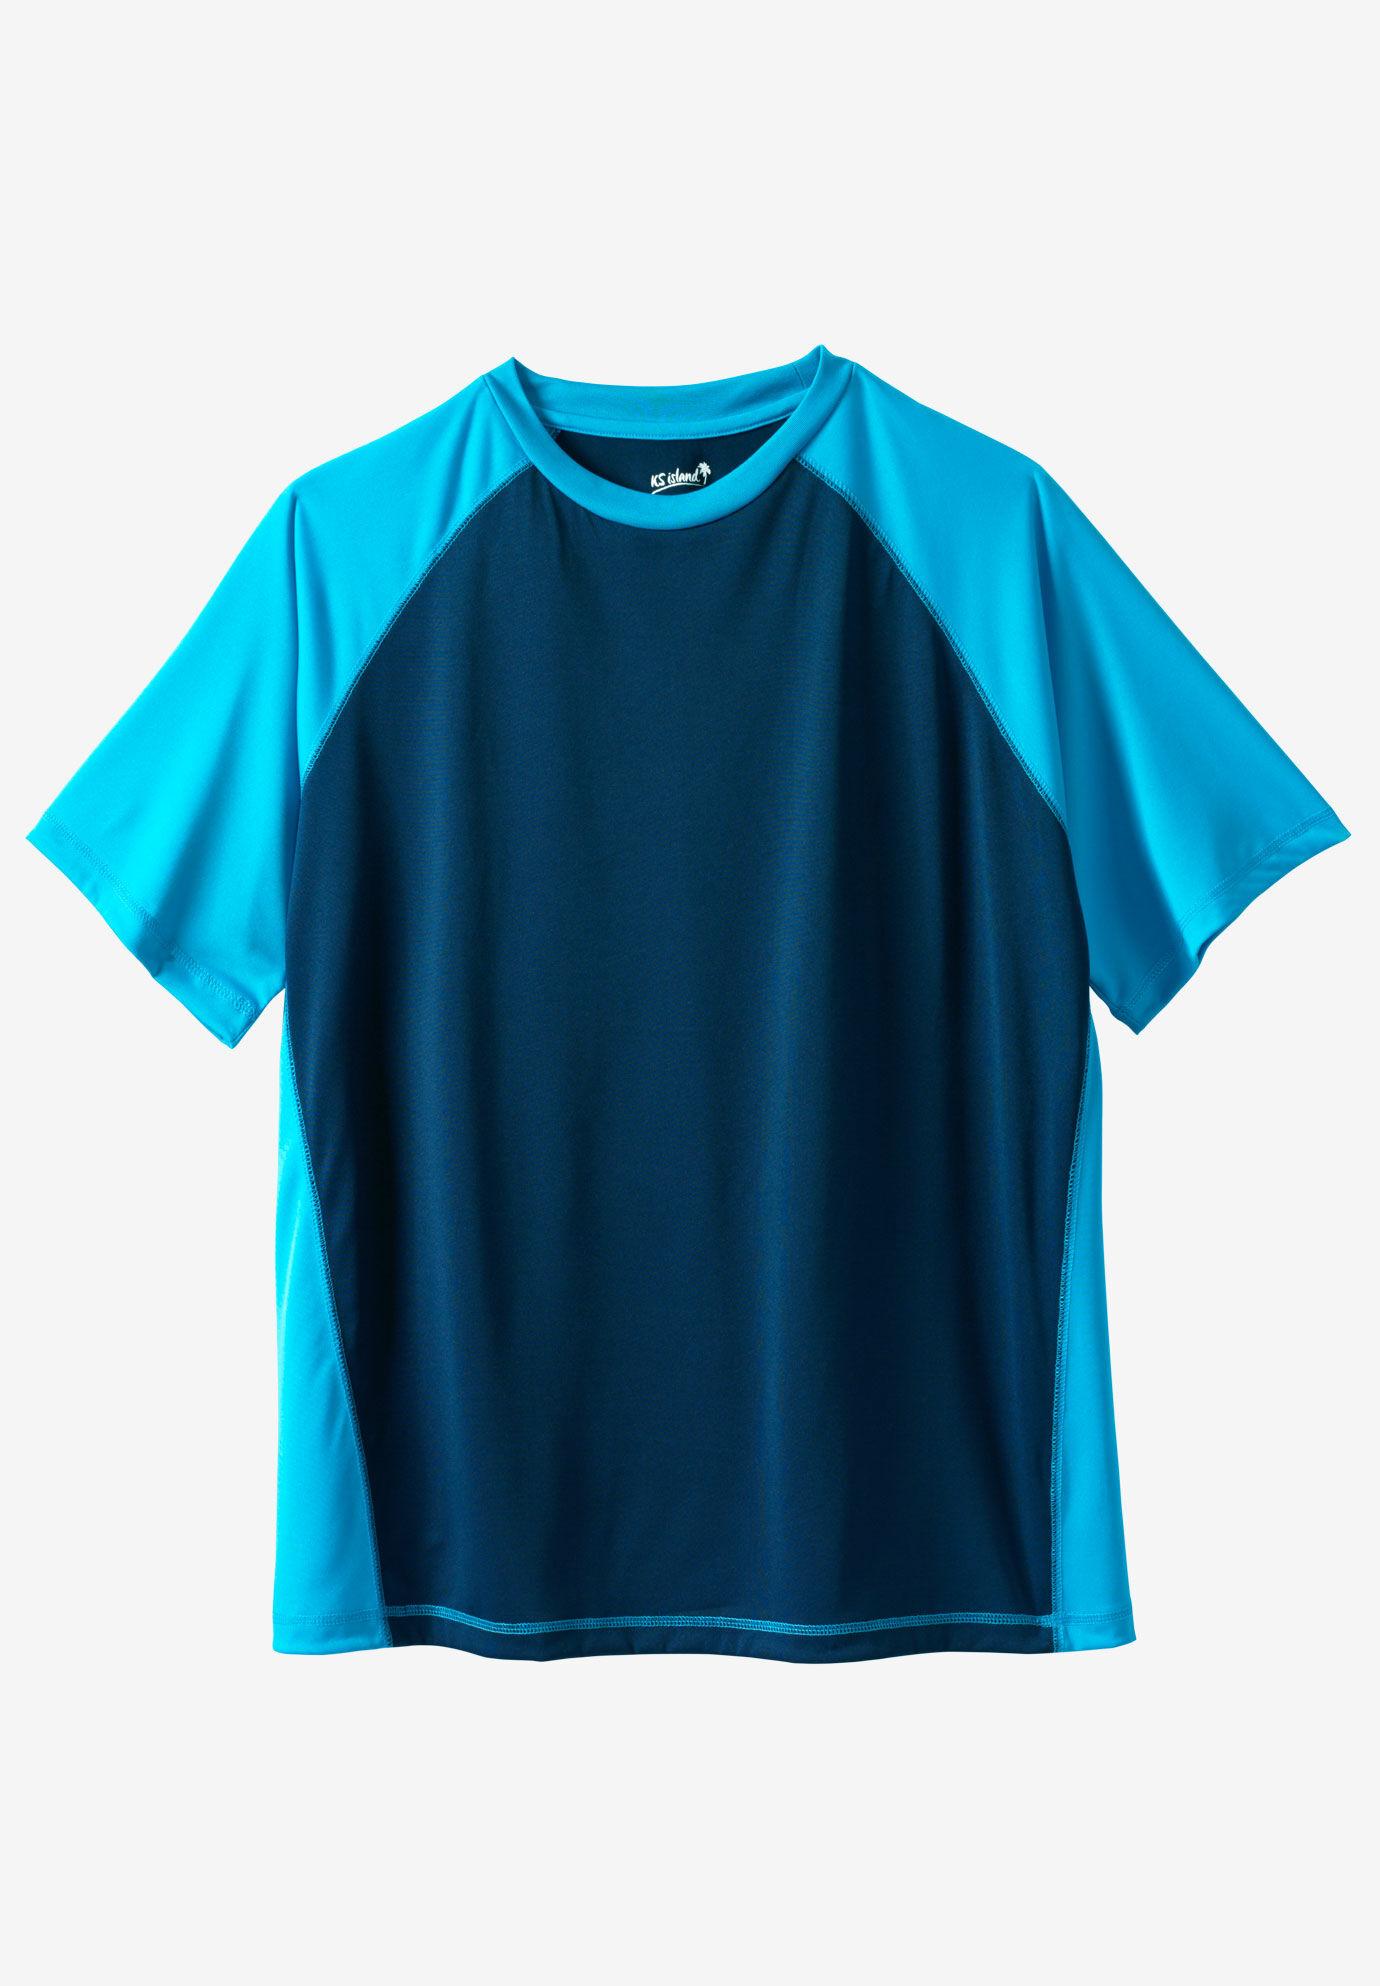 KS Island Mens Big /& Tall Island Print Rayon Shirt